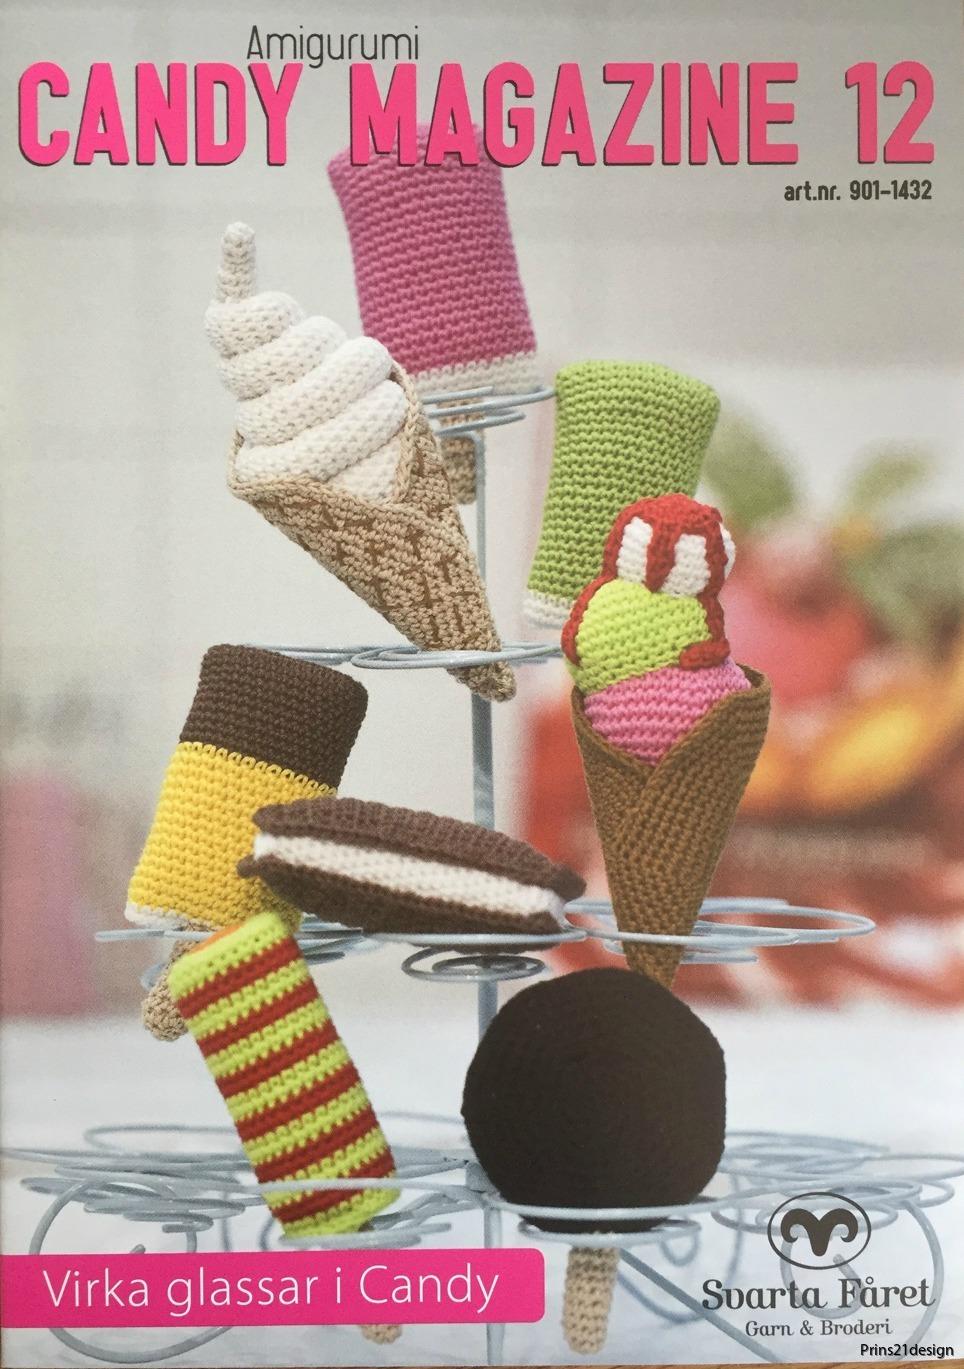 Candy Magazine 12